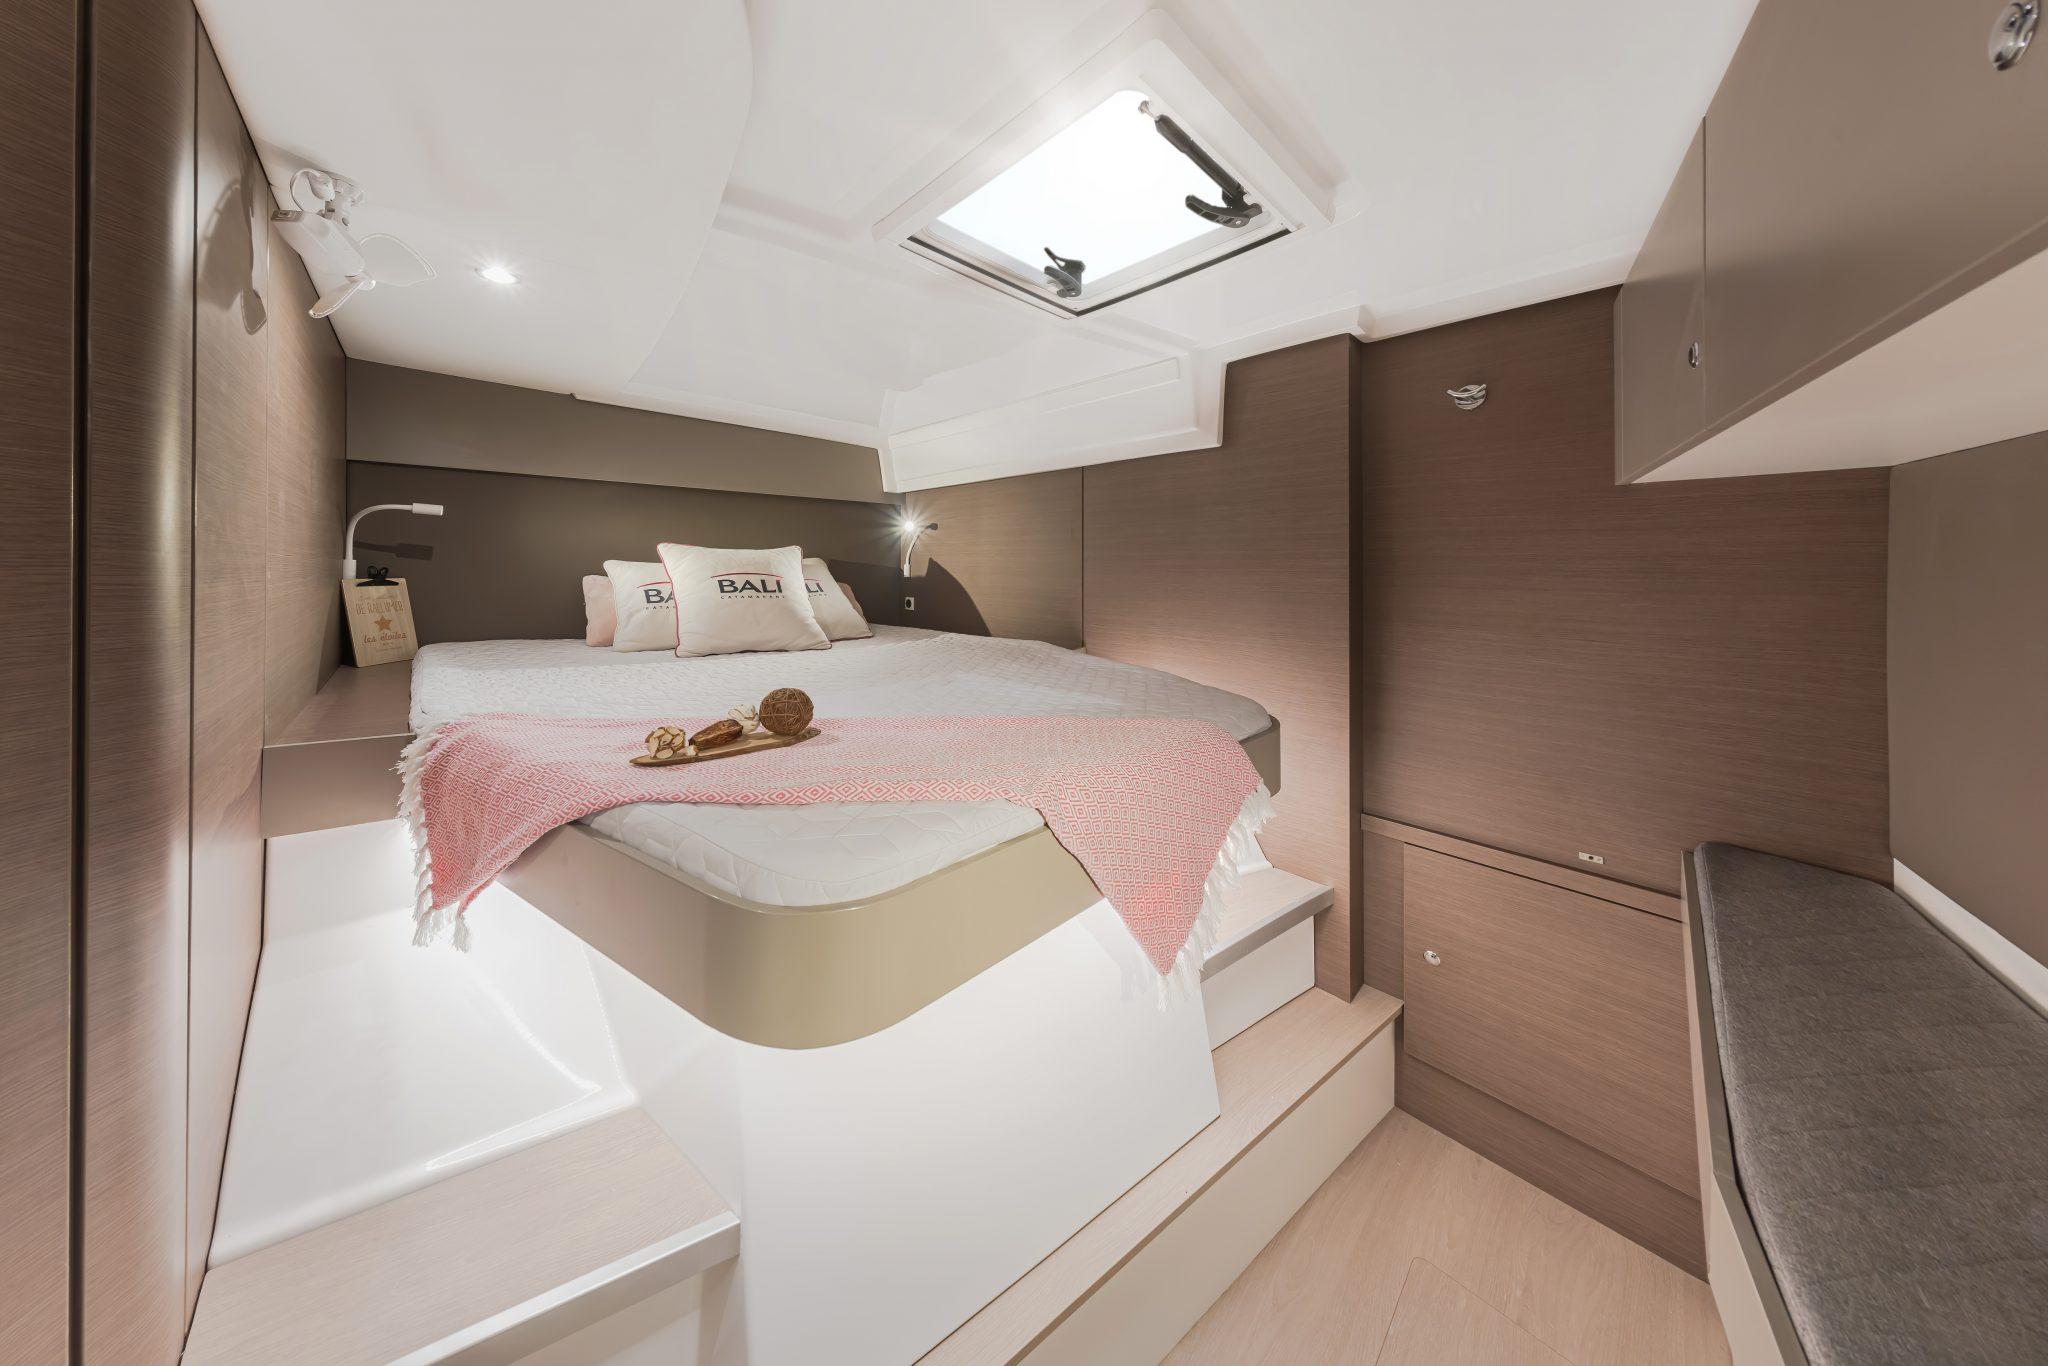 bali-catspace-cabin_5